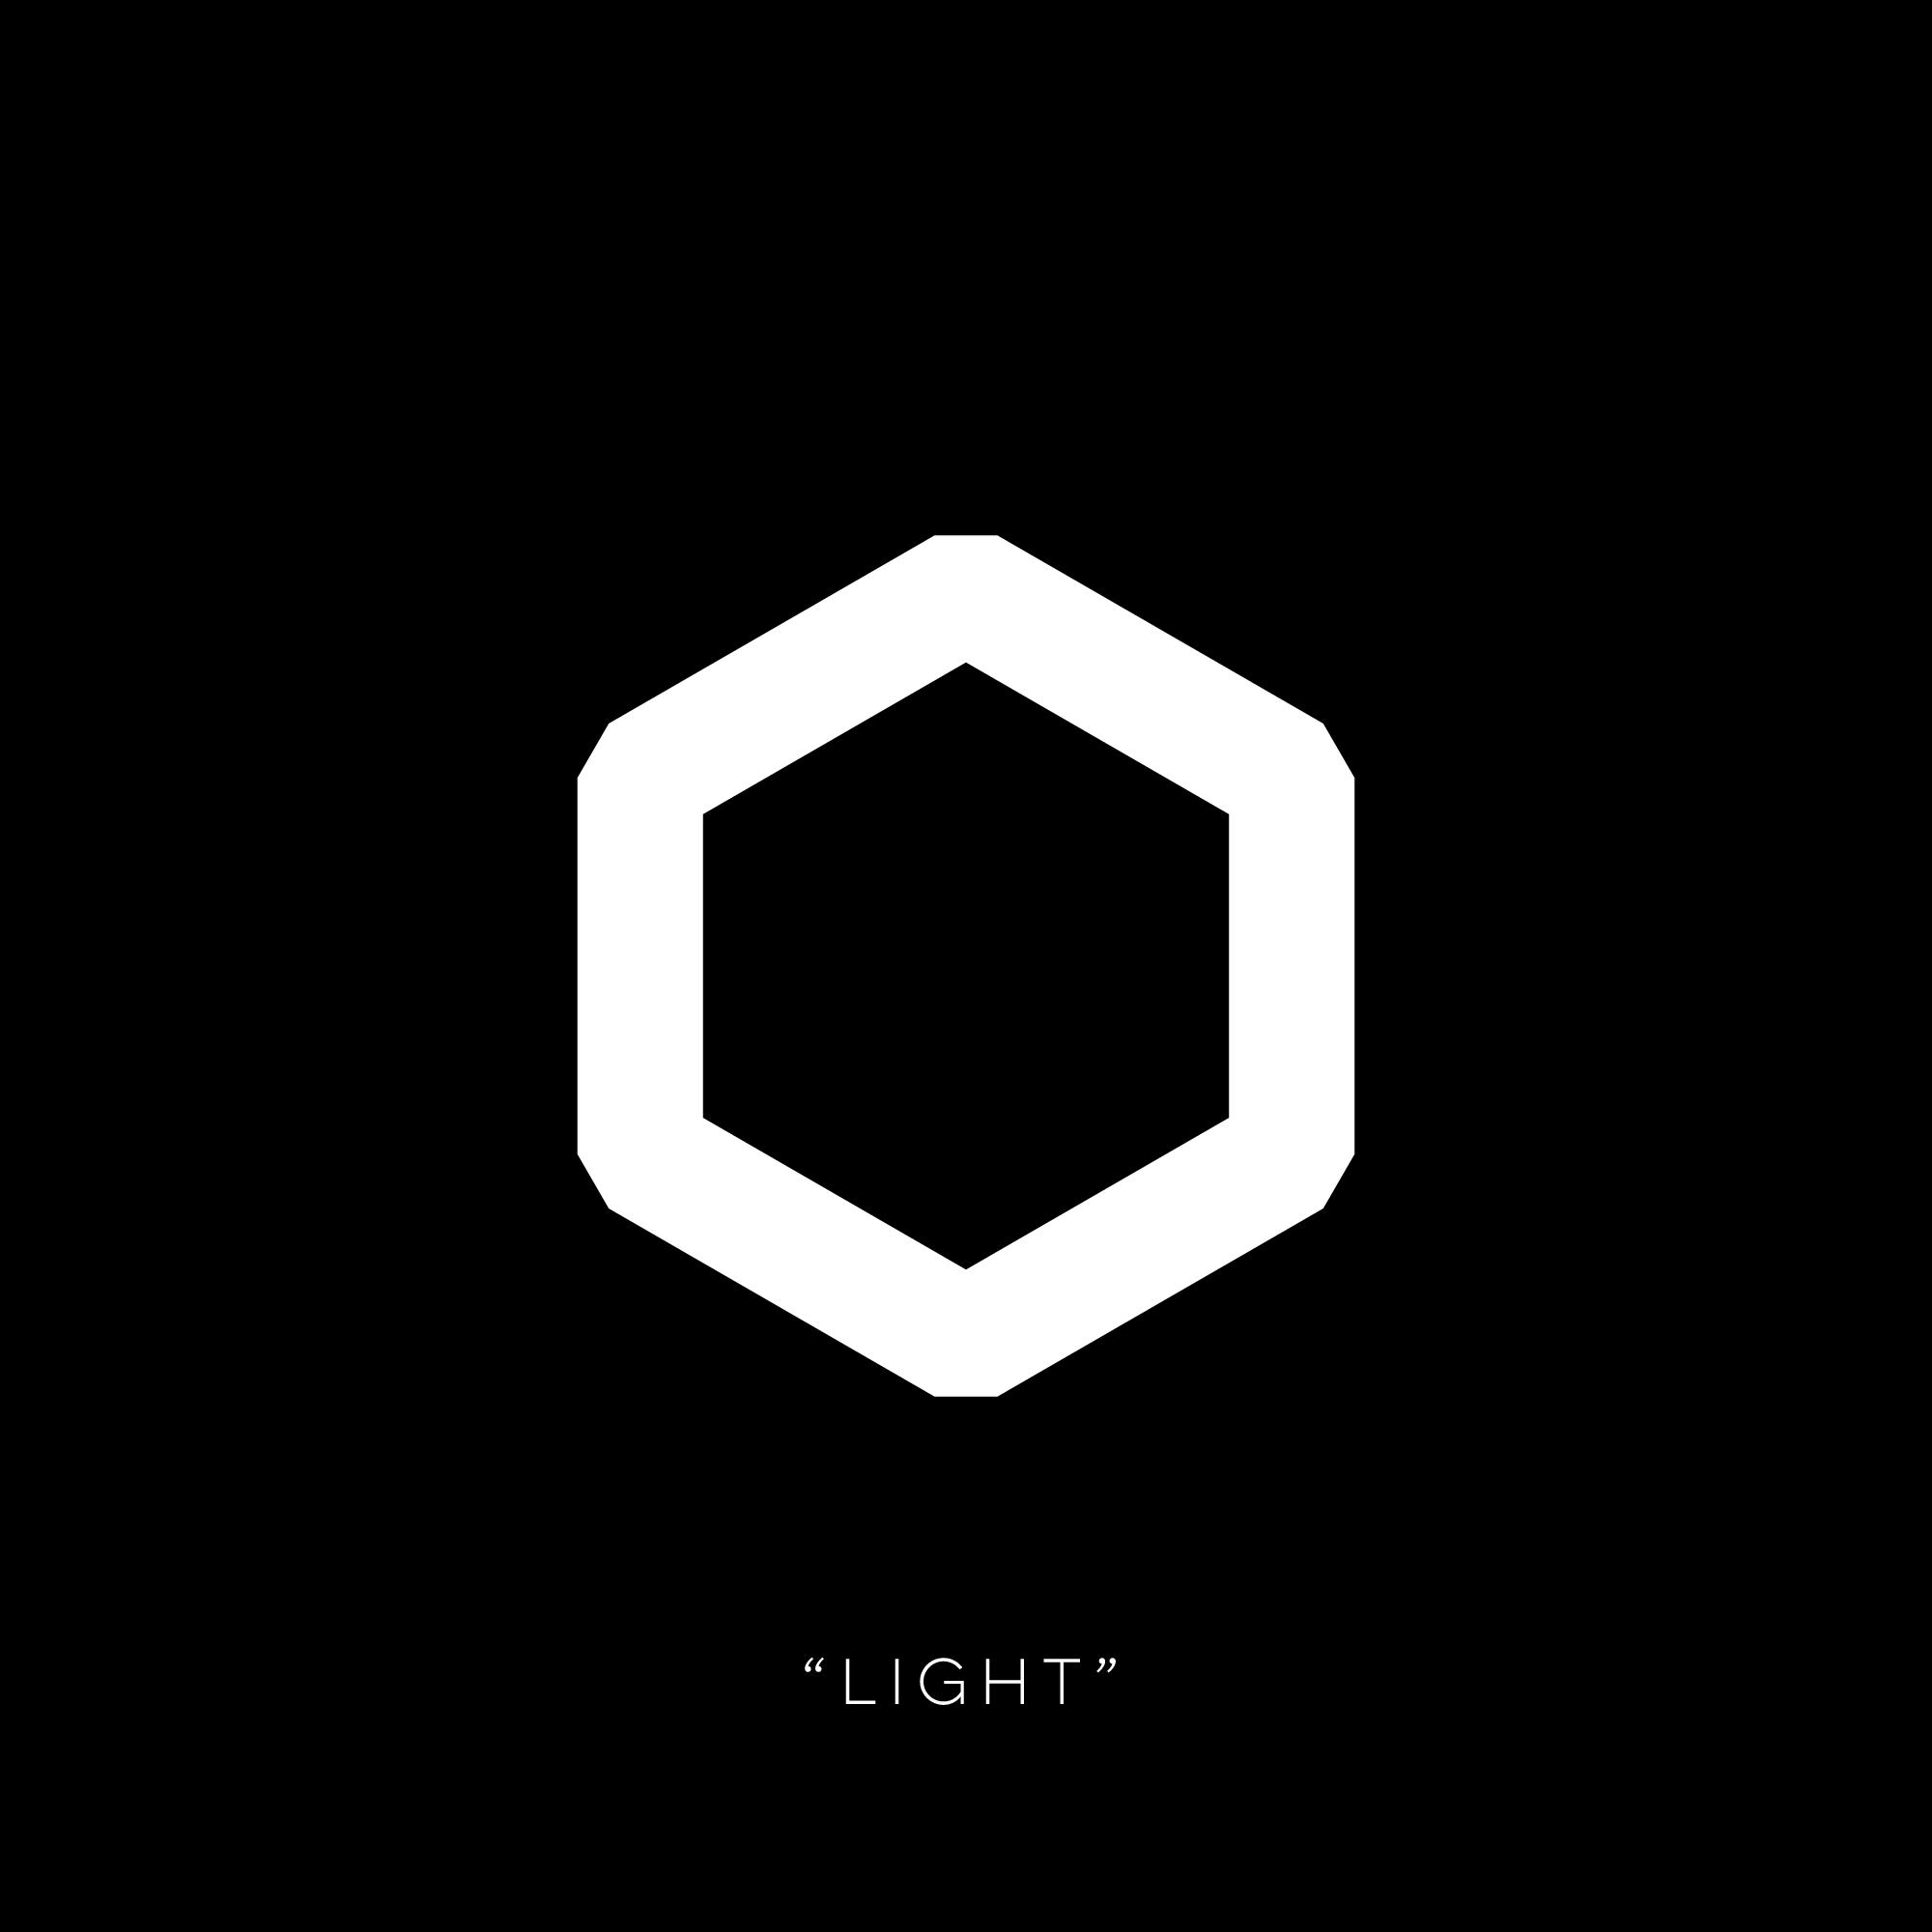 3 LIGHT.png